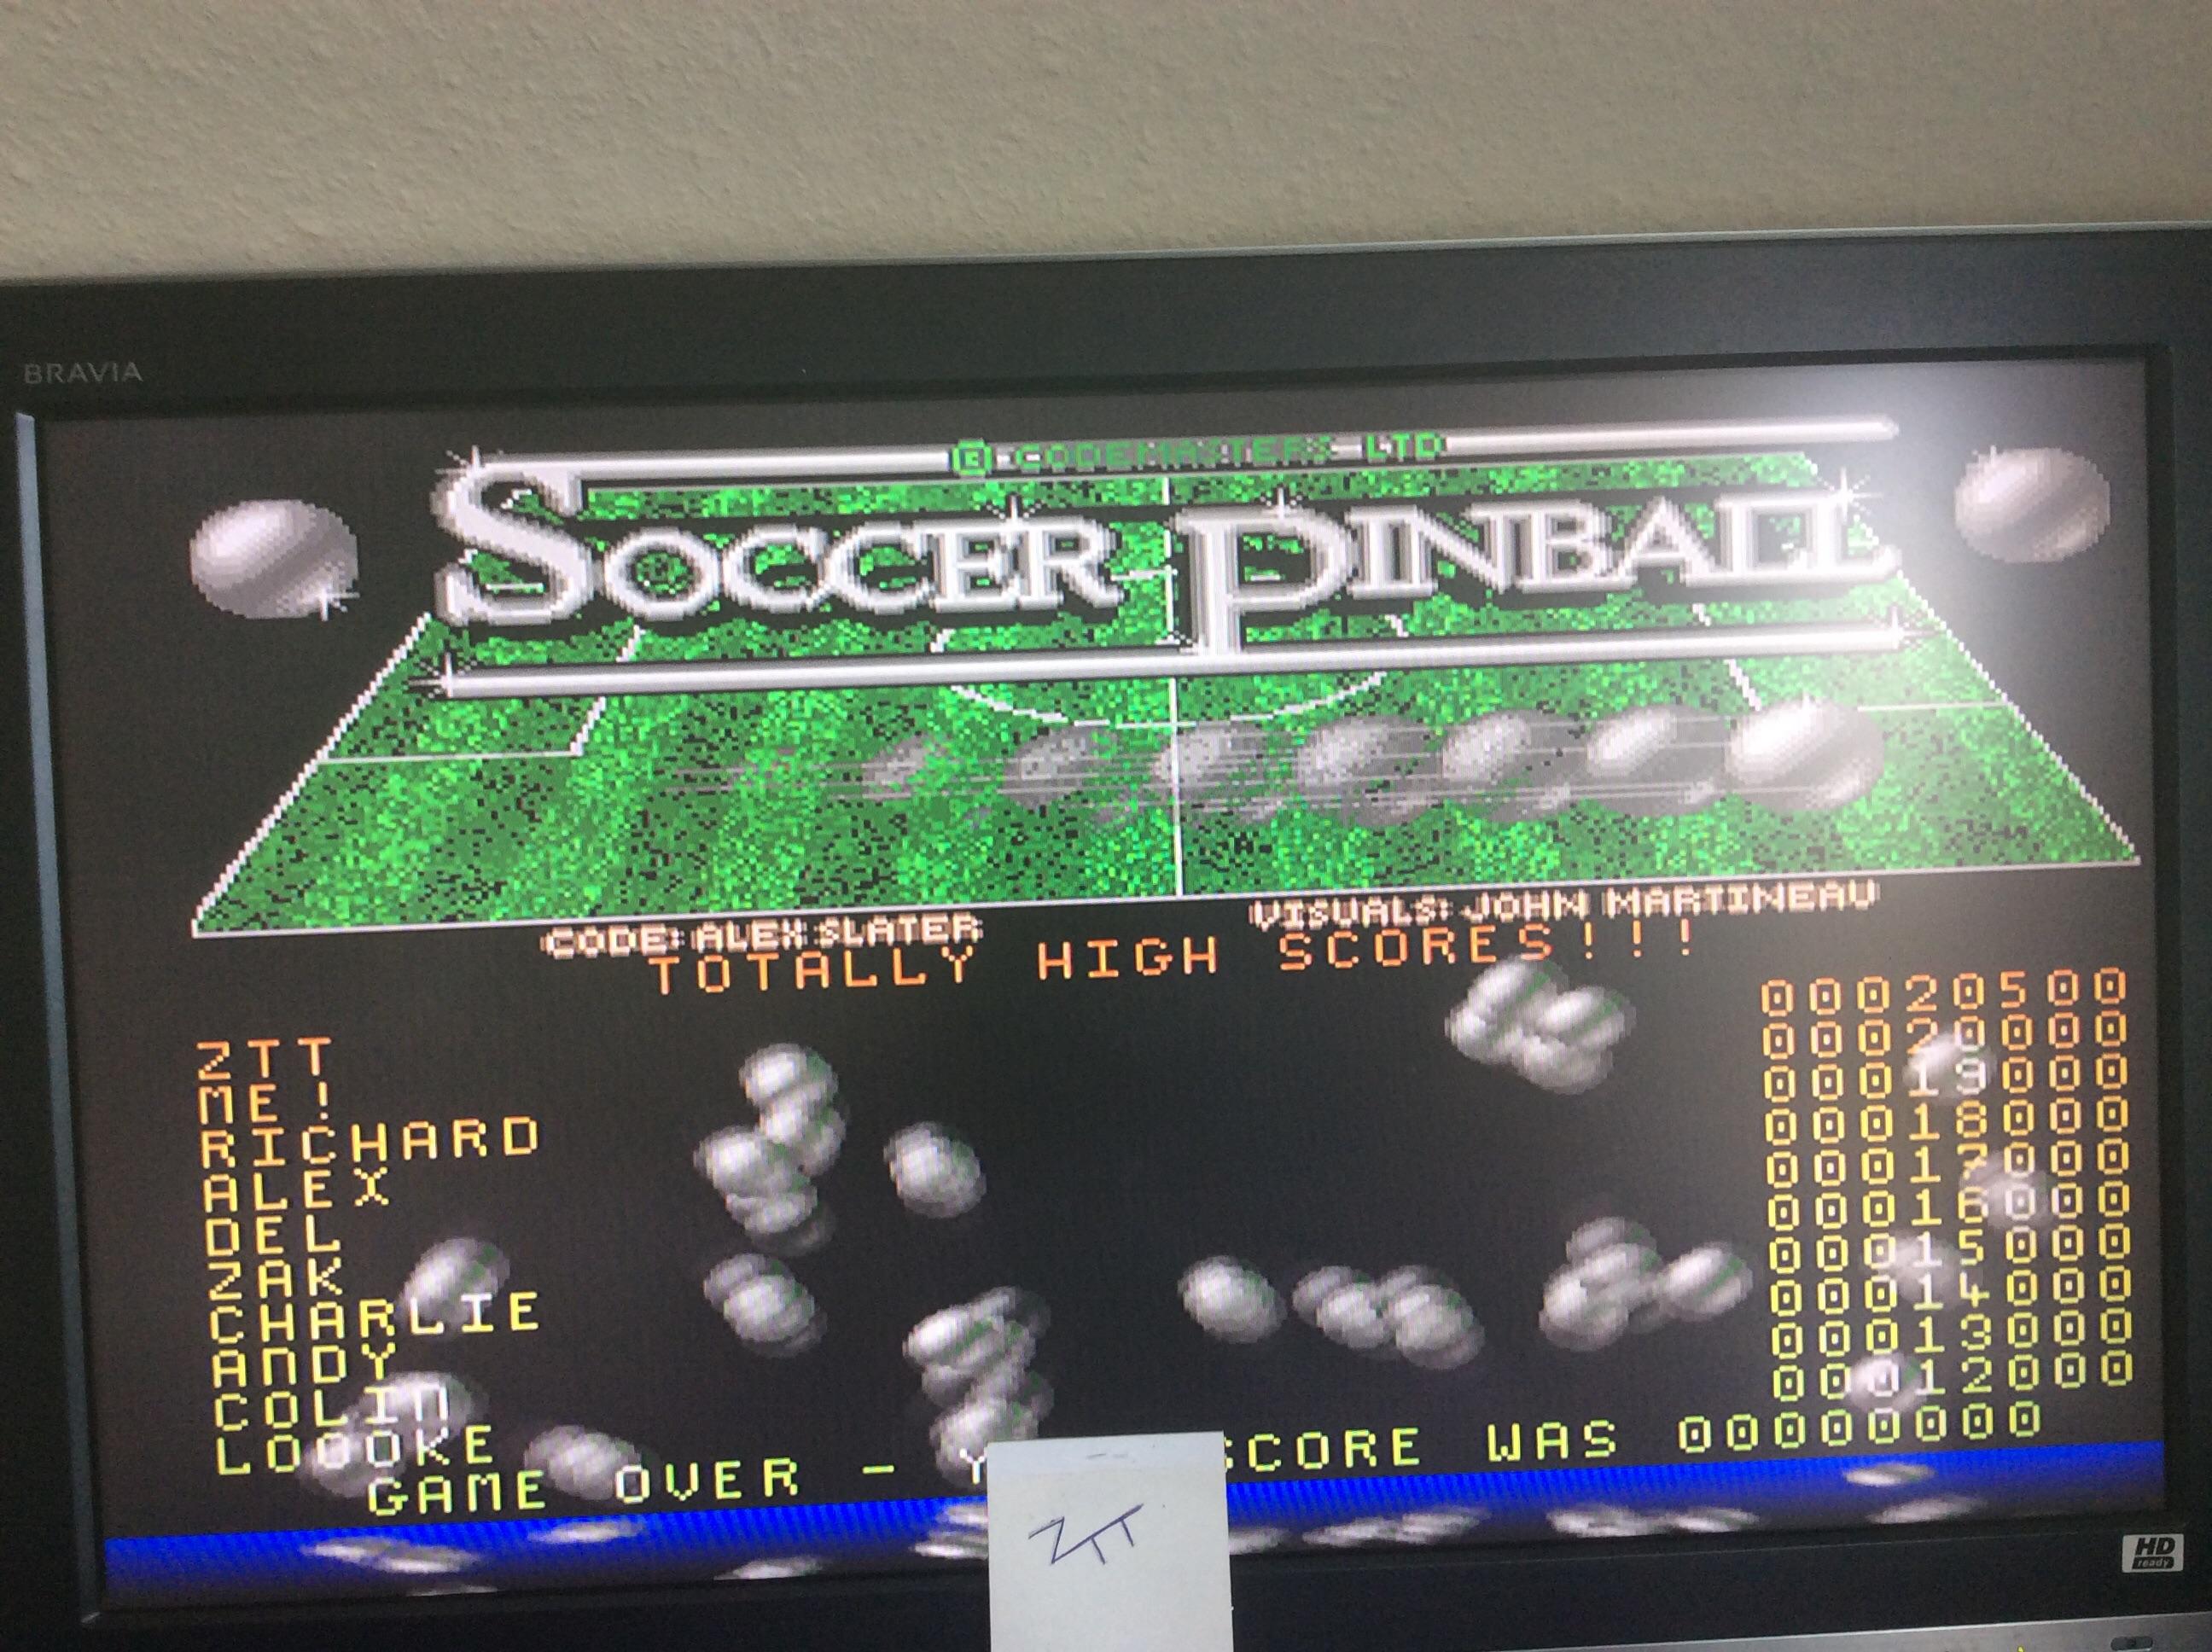 Frankie: Soccer Pinball (Amiga) 20,500 points on 2016-10-29 07:07:14